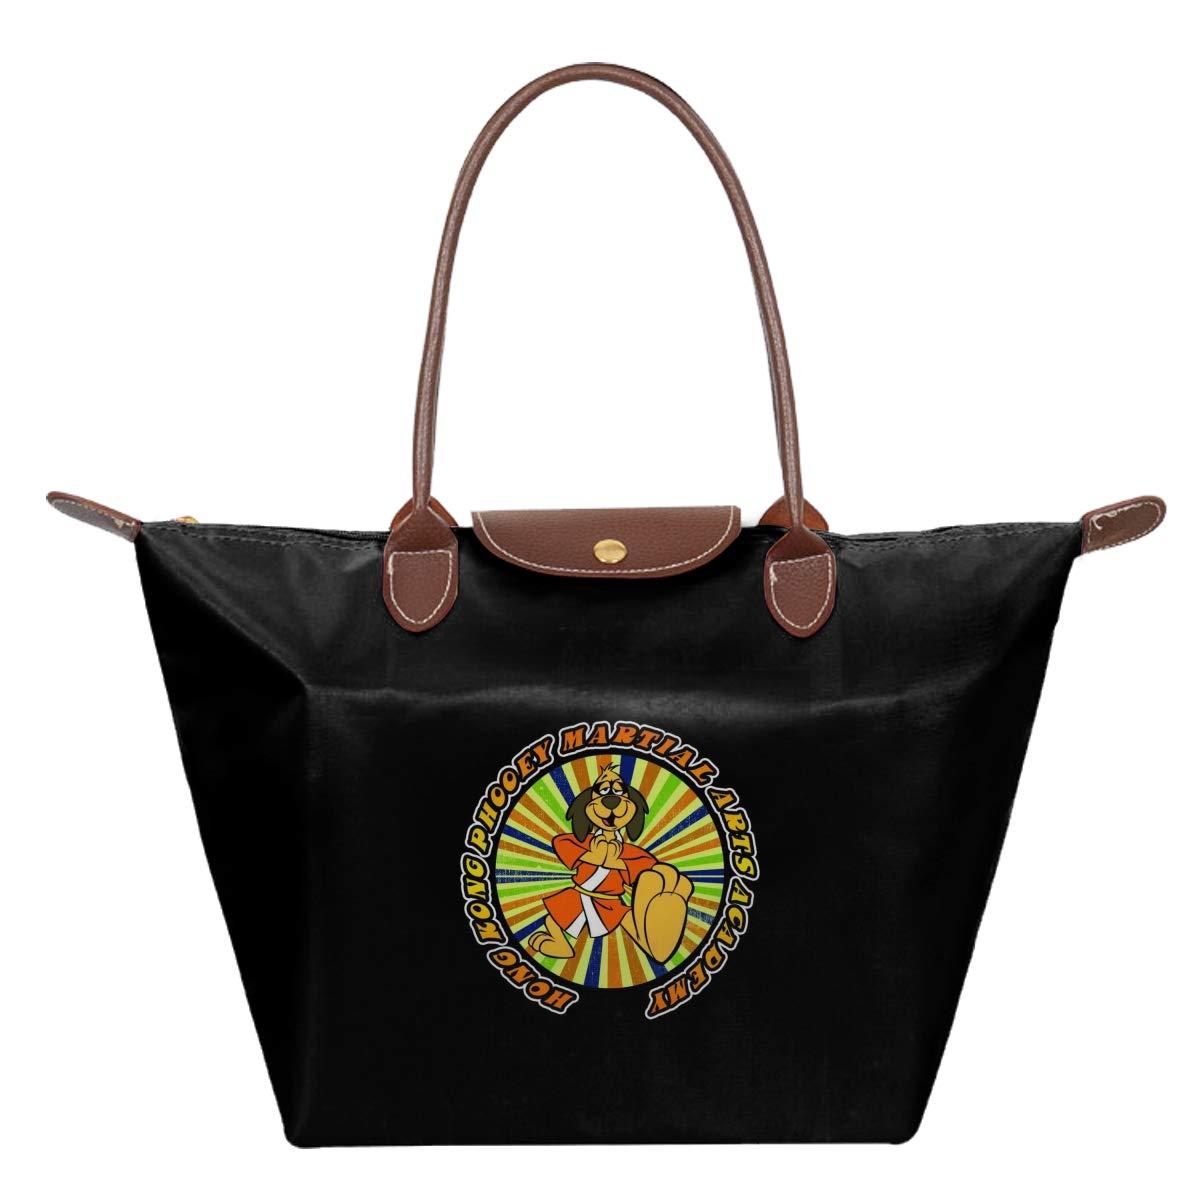 Hong Kong Phooey Martial Arts Training Academy Waterproof Leather Folded Messenger Nylon Bag Travel Tote Hopping Folding School Handbags